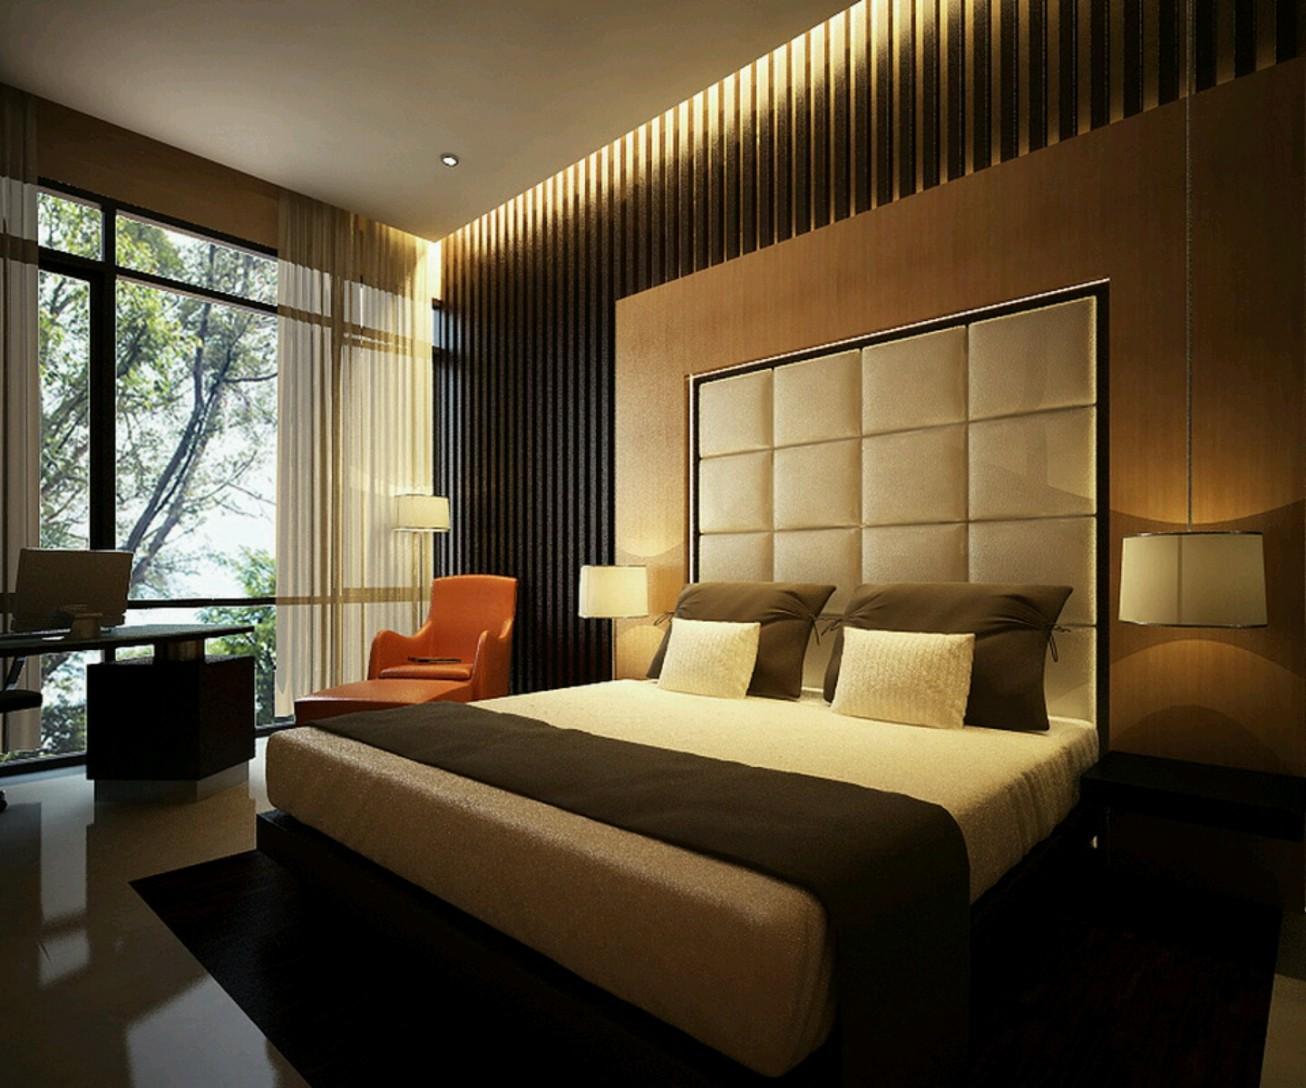 25 Best Bedroom Designs Ideas on Simple Best Bedroom Design  id=50618